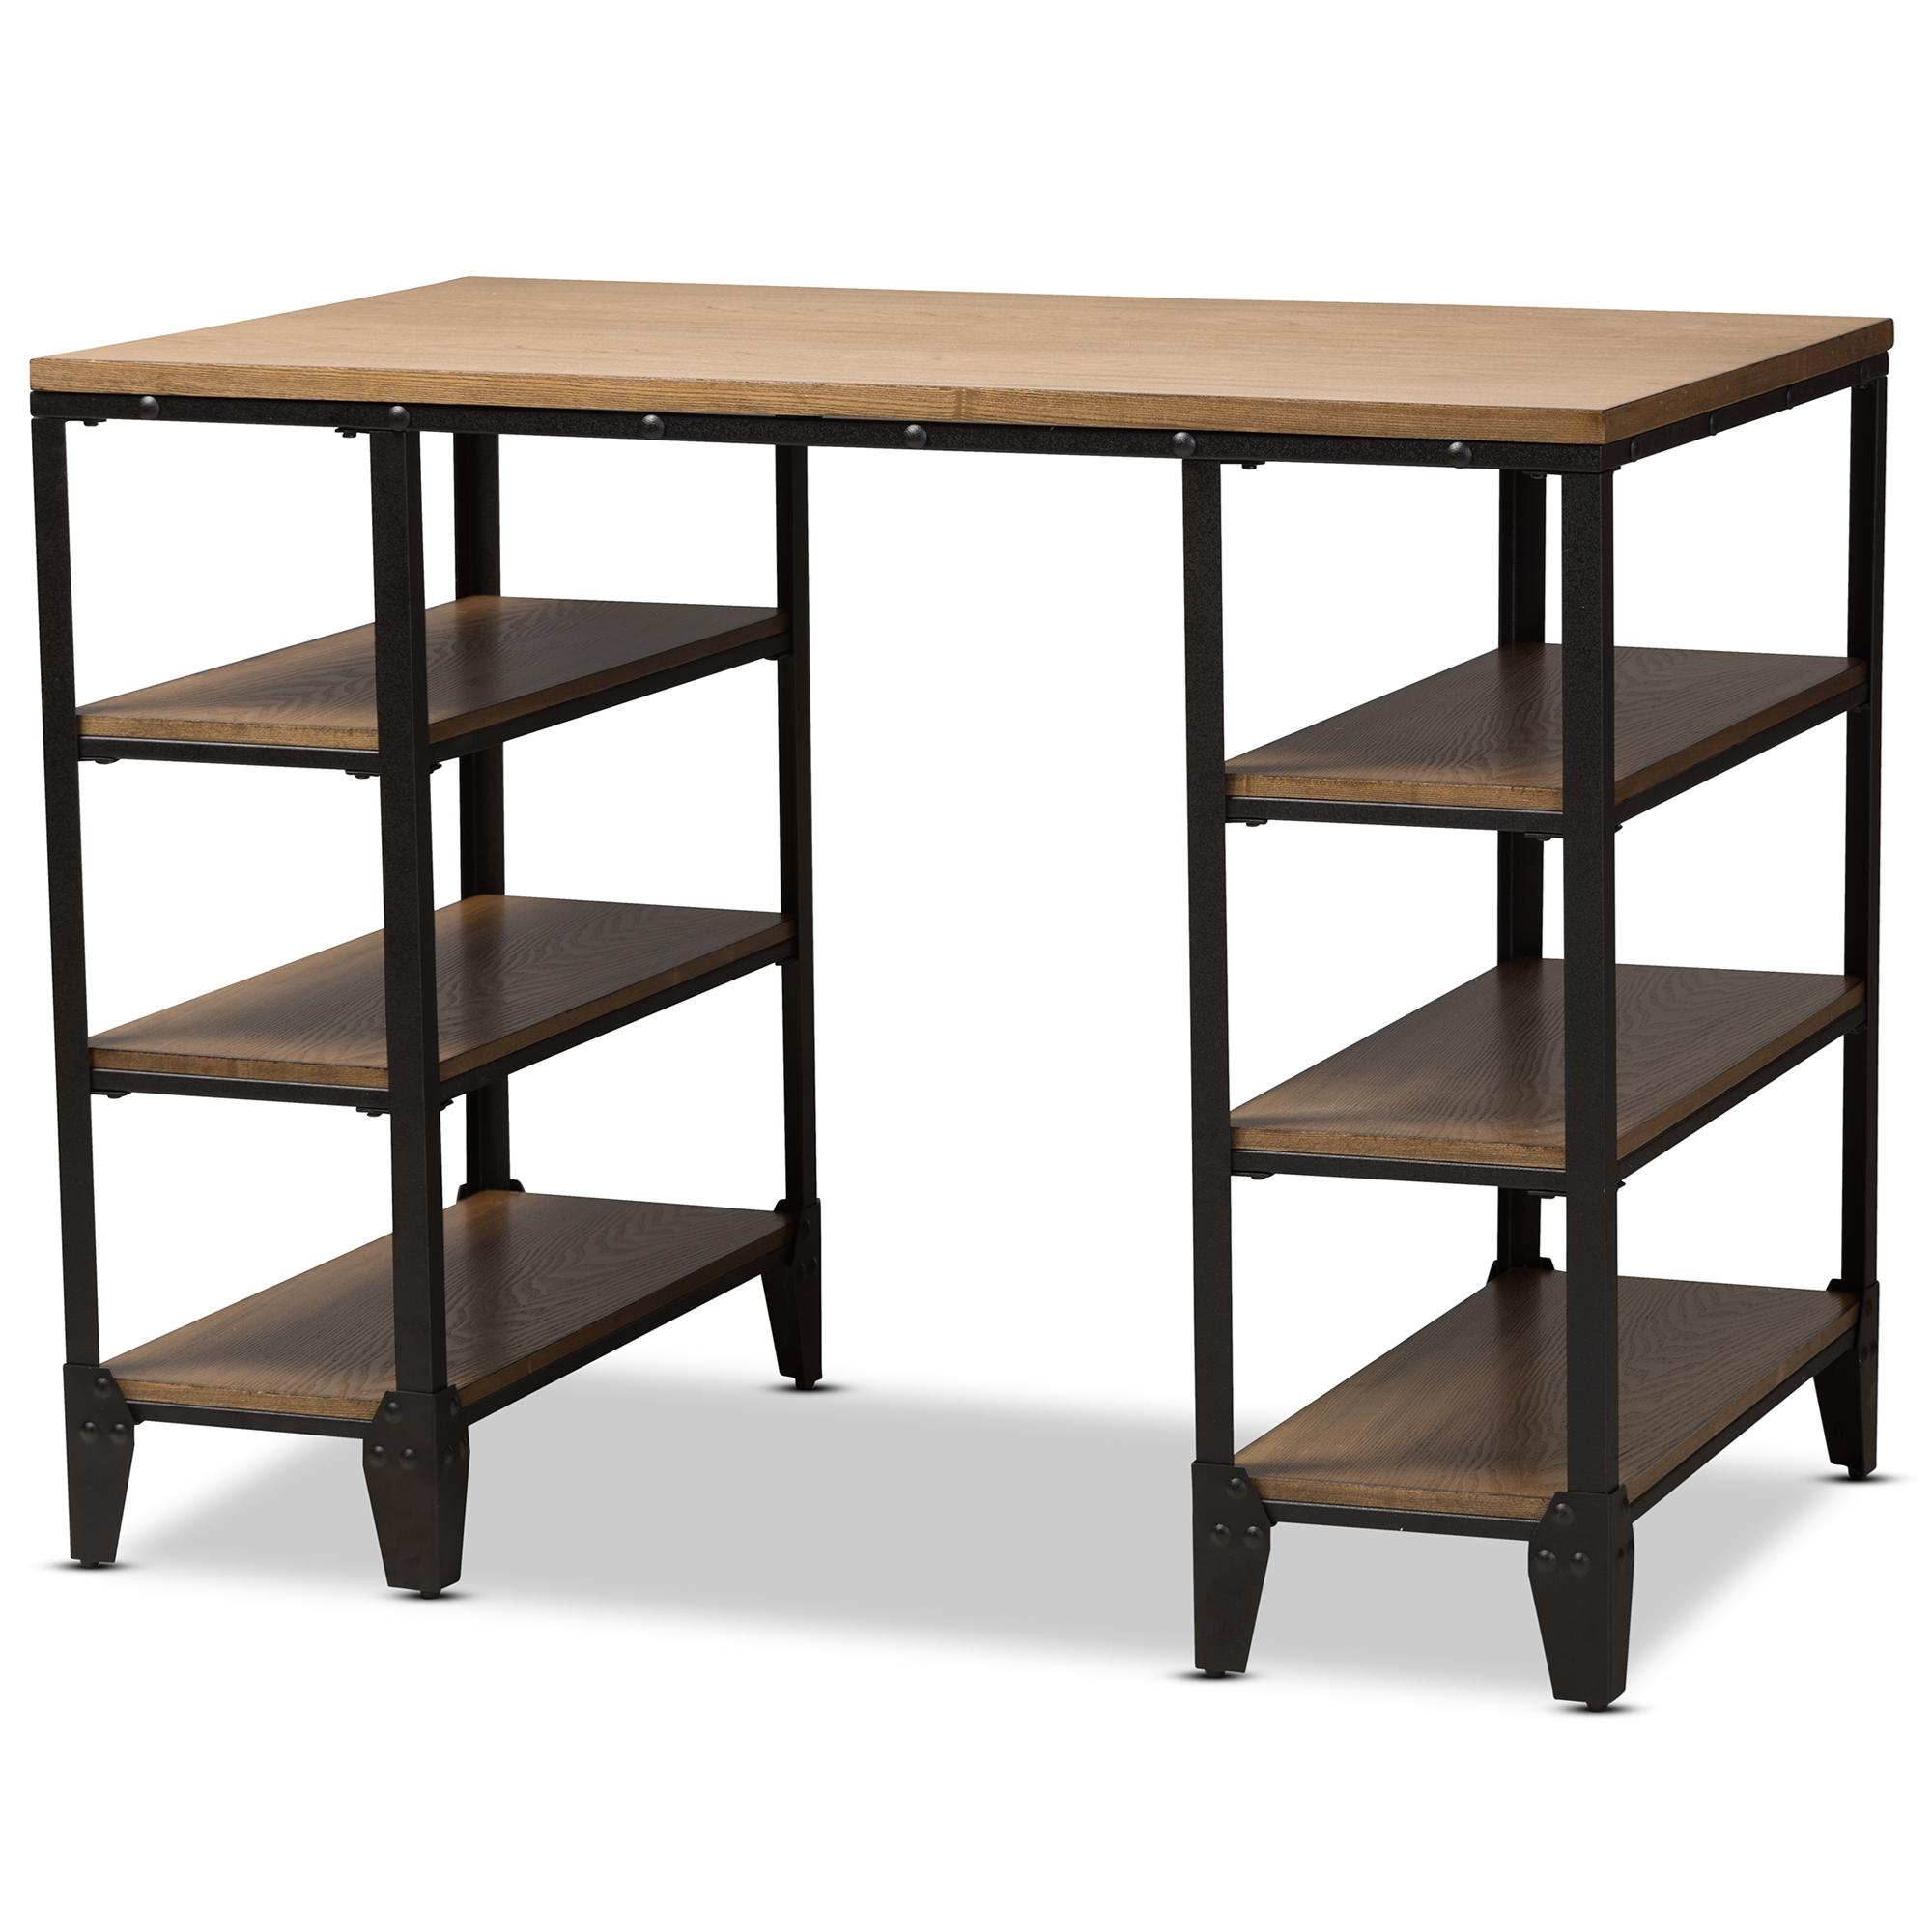 Baxton Studio Pepe Rustic Metal And Distressed Wood Storage Desk